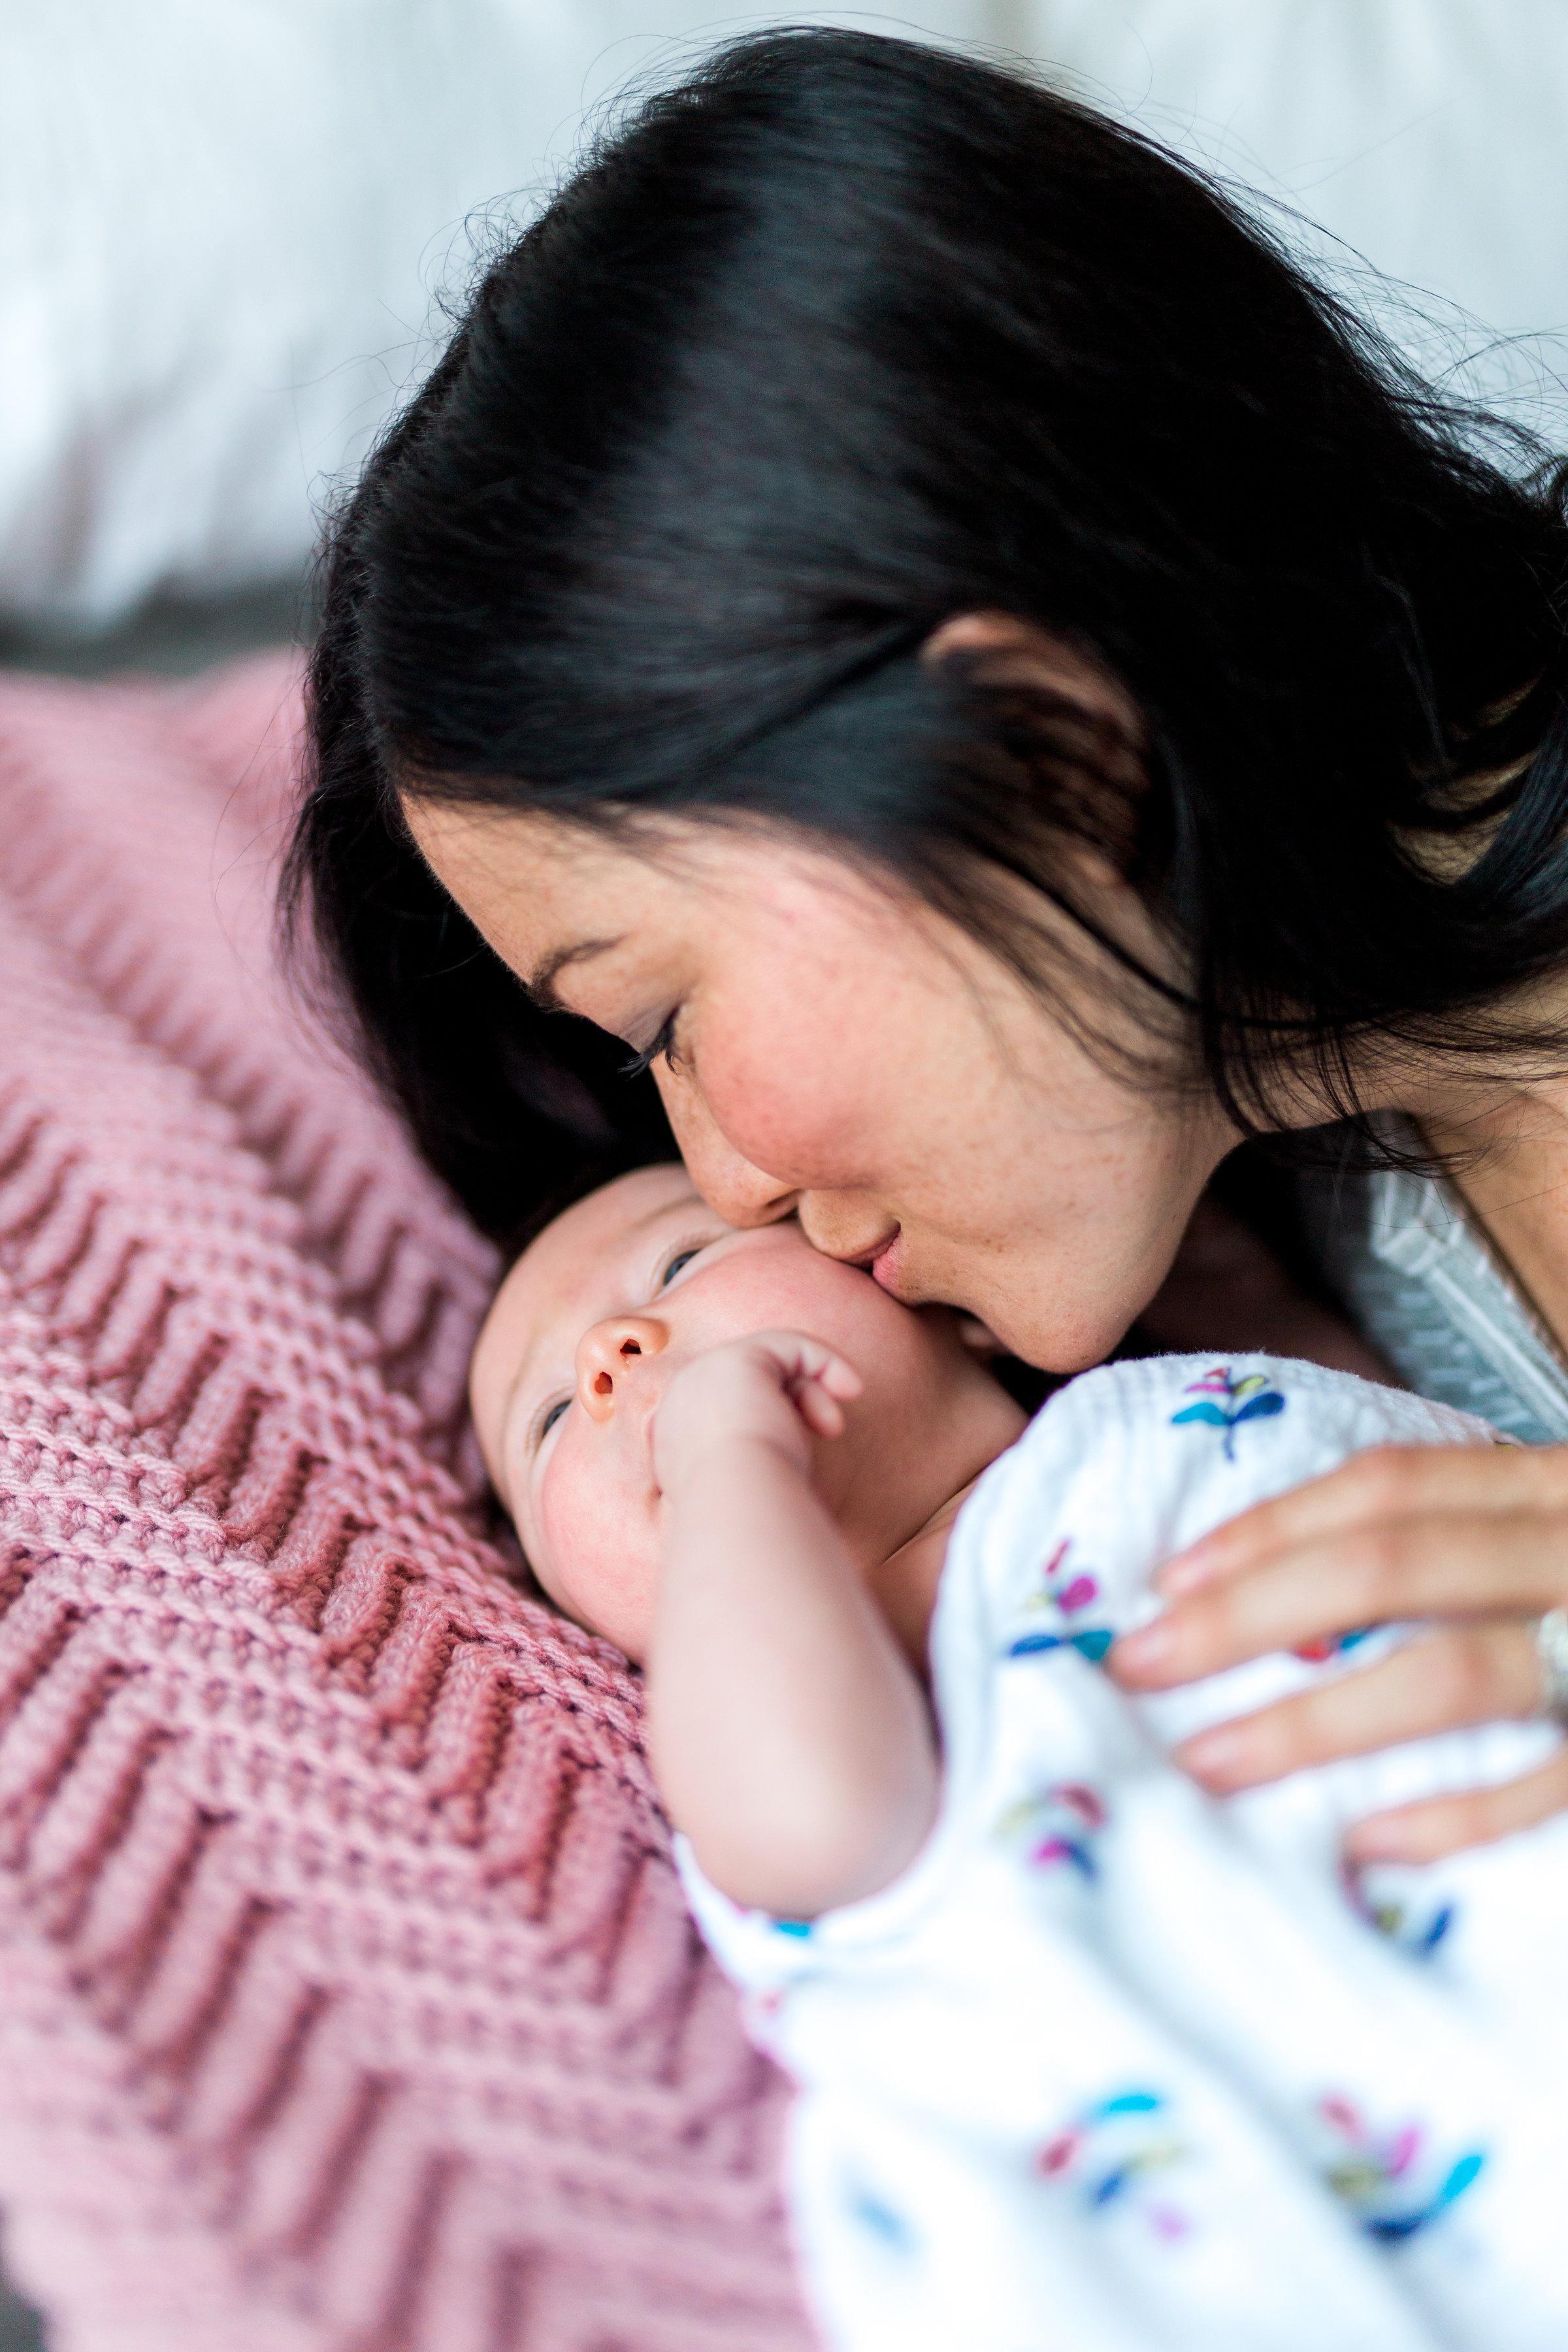 Danielle-Giroux-Newborn-Family-Photography-Toronto_BabyQuinn_166.jpg